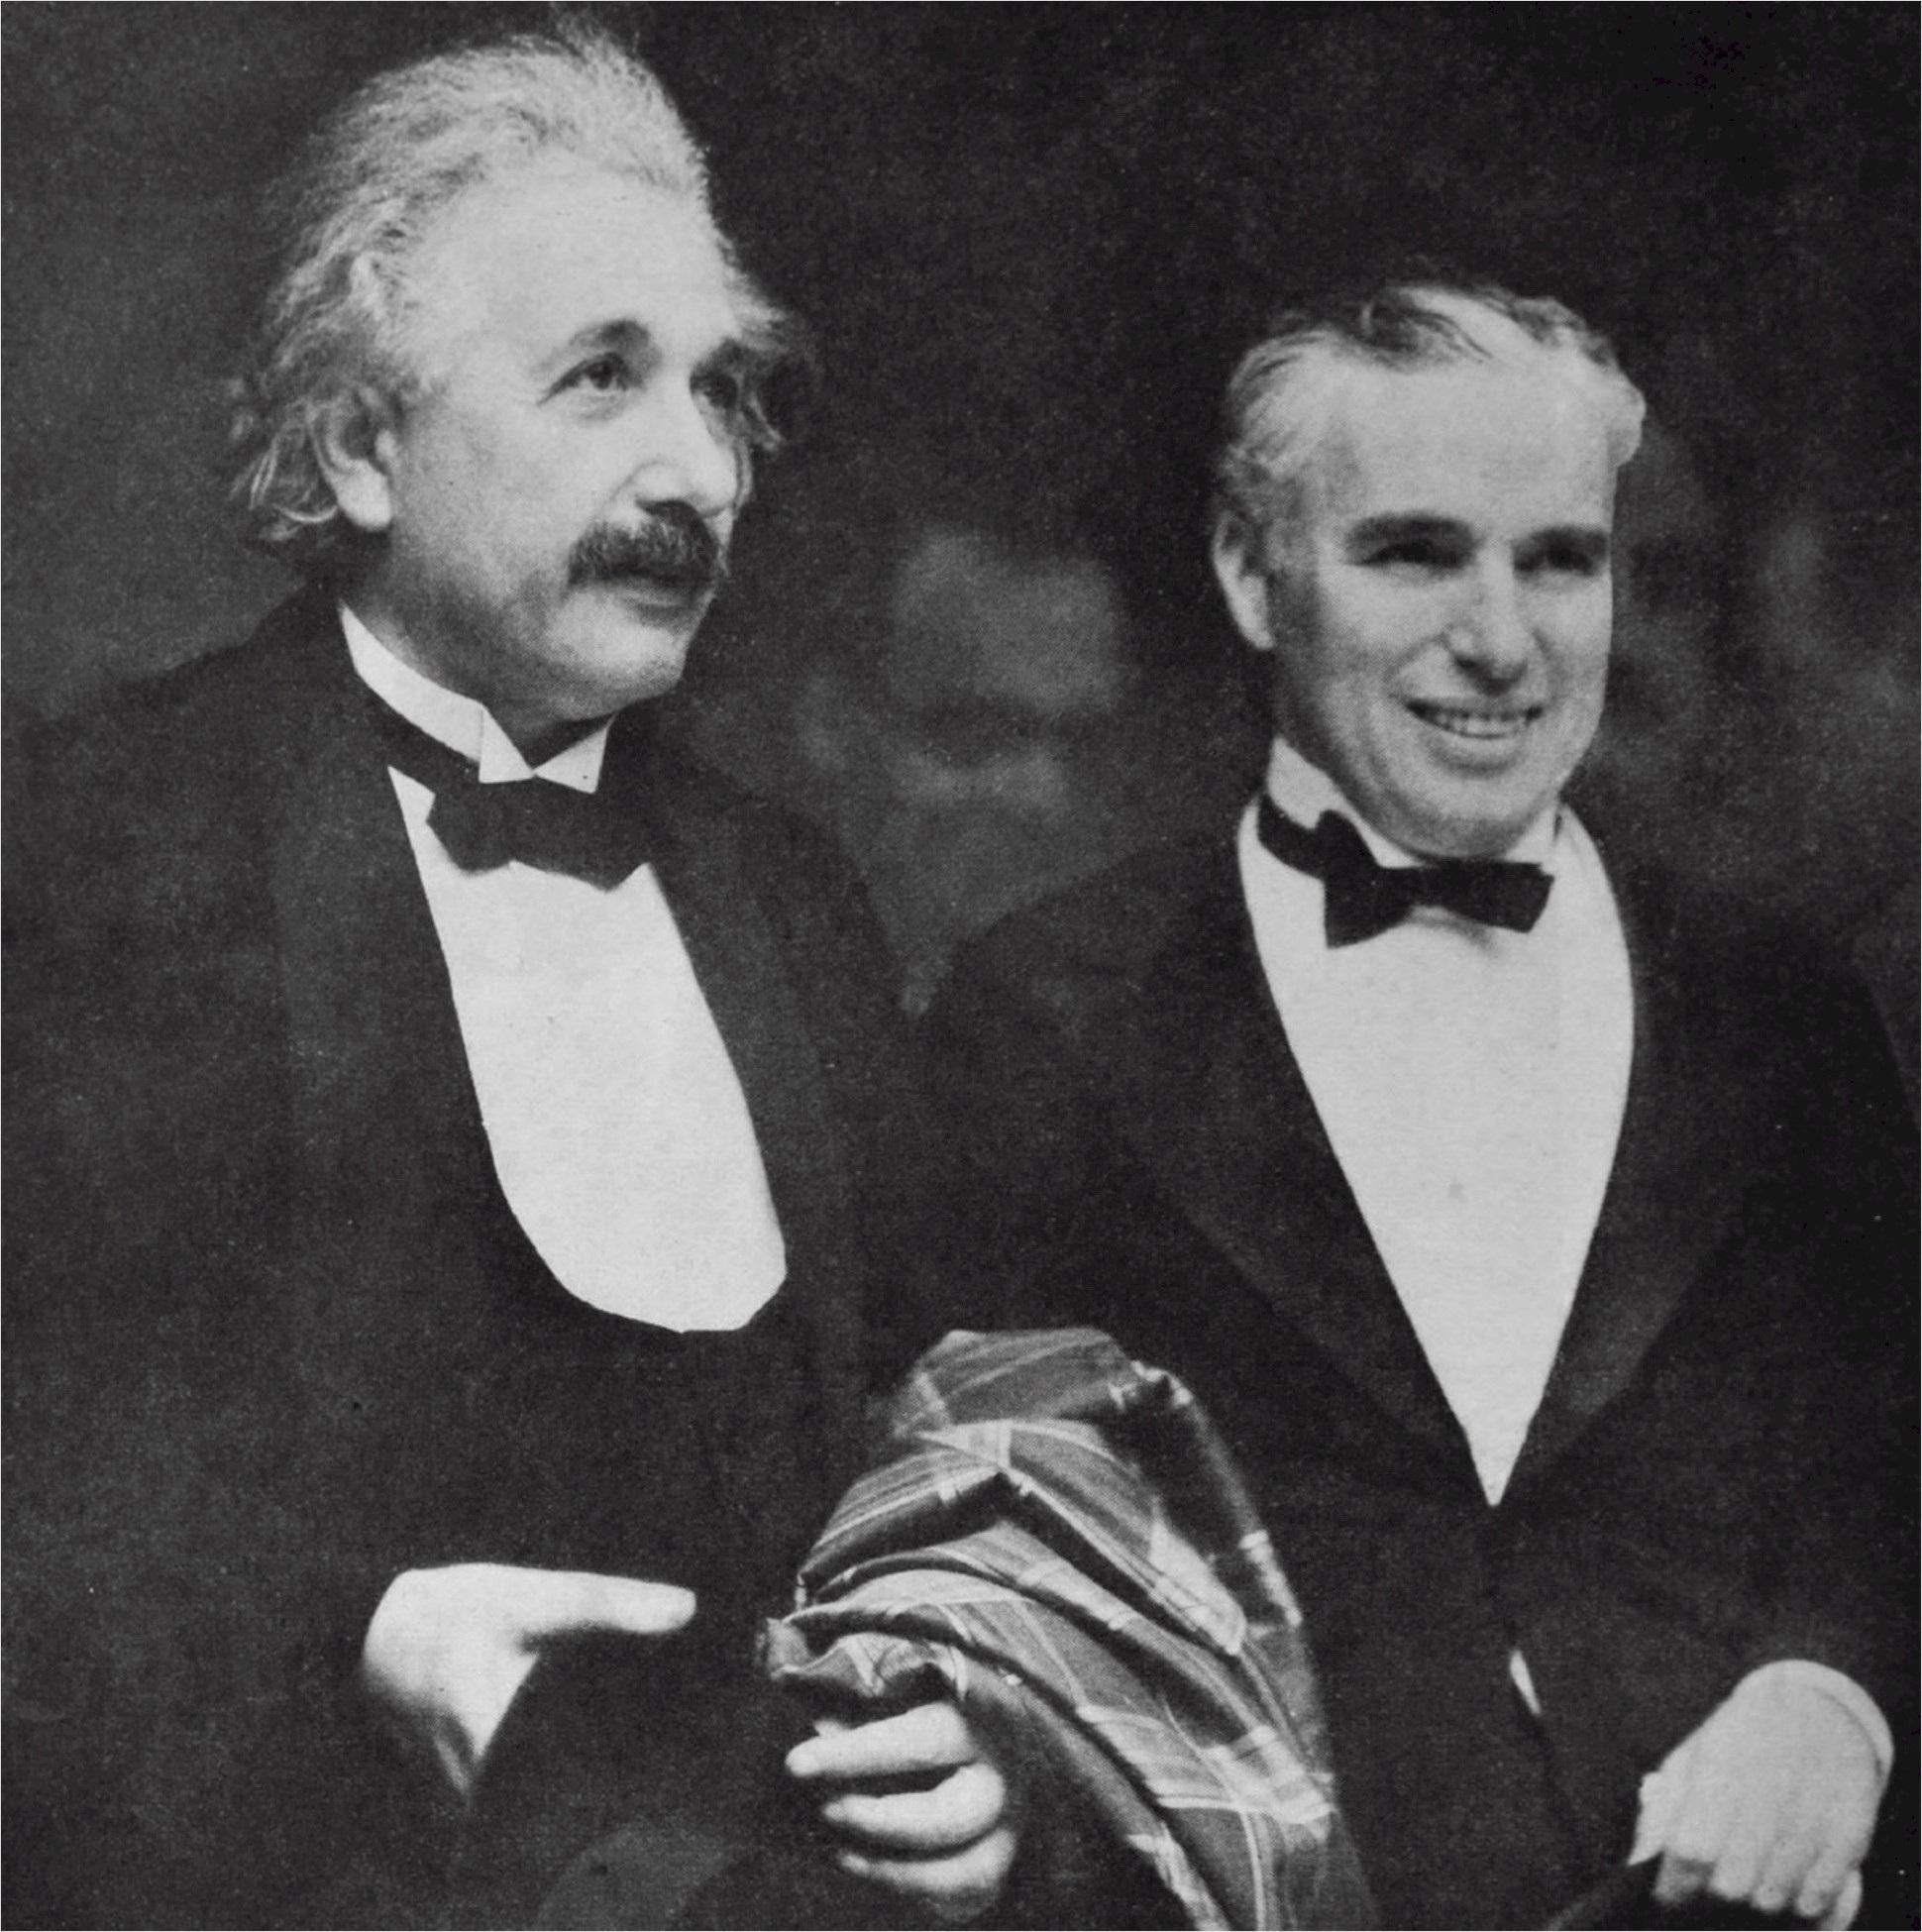 Chaplin & Jackie Coogan: On the set of THE KID